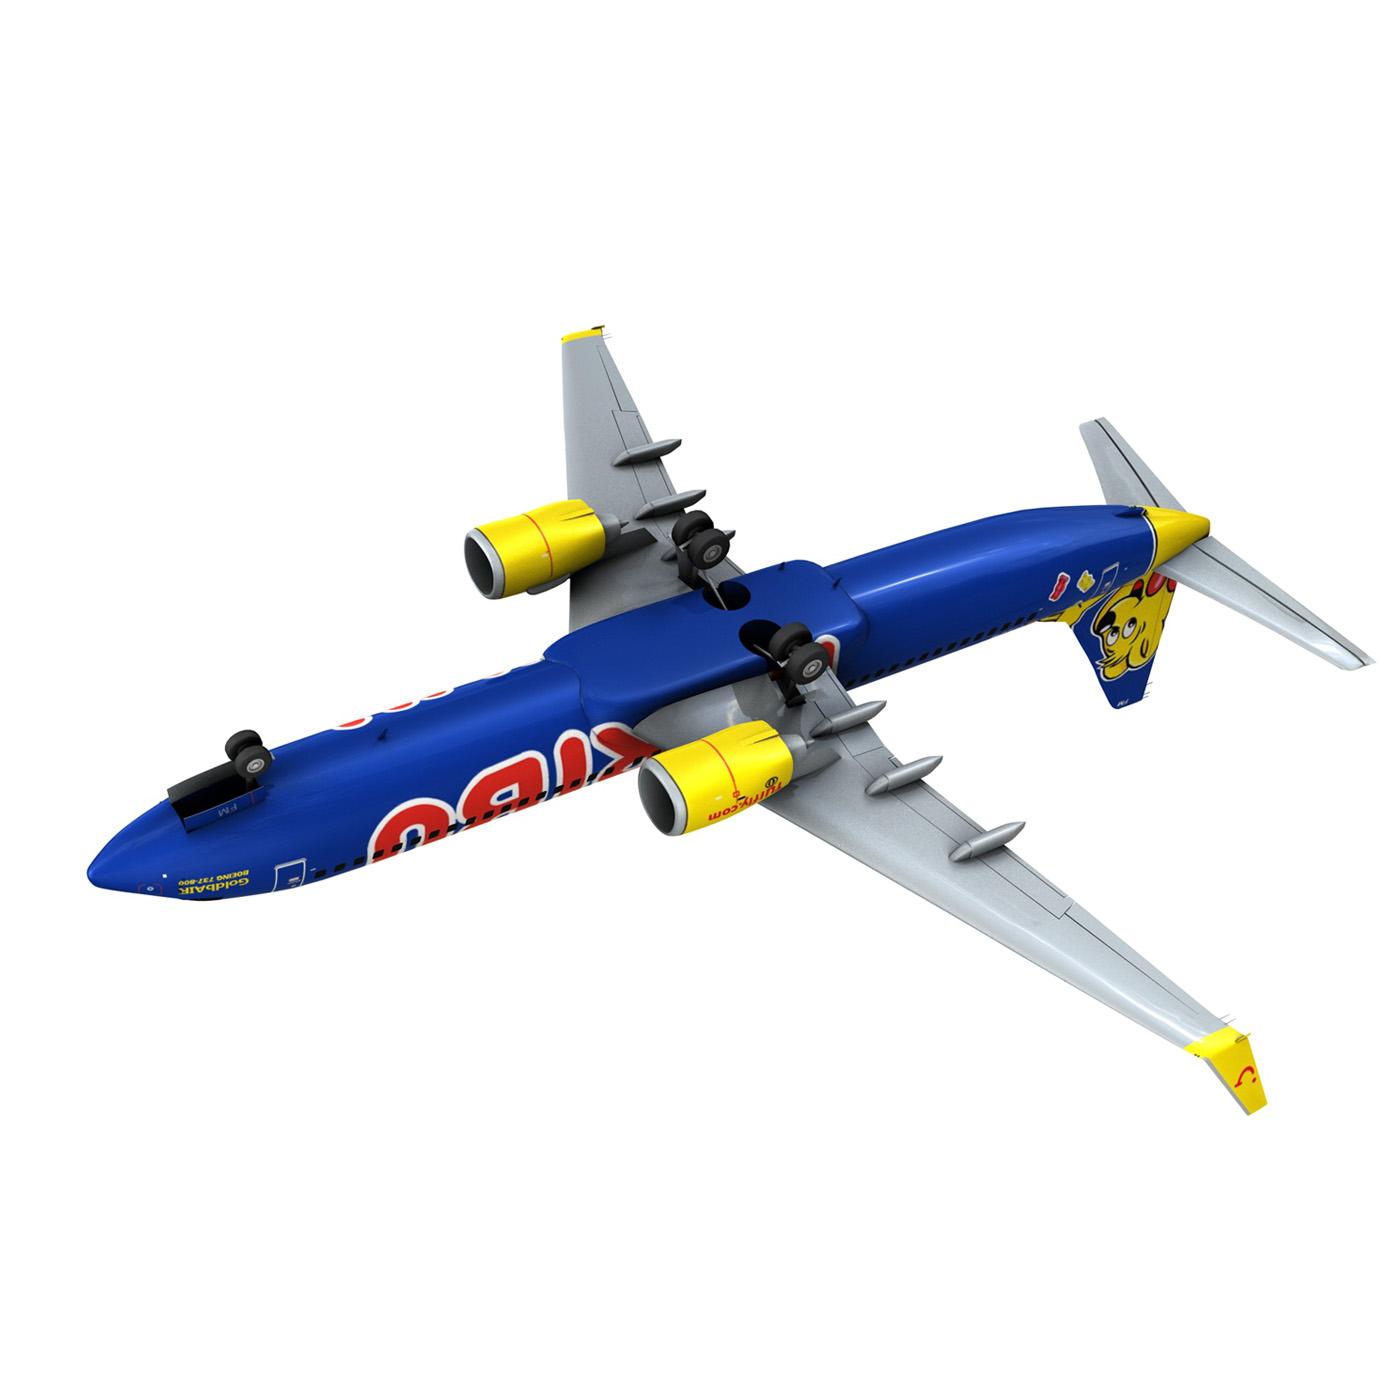 boeing 737-800 goldbair 3d model 3ds fbx c4d lwo obj 293507